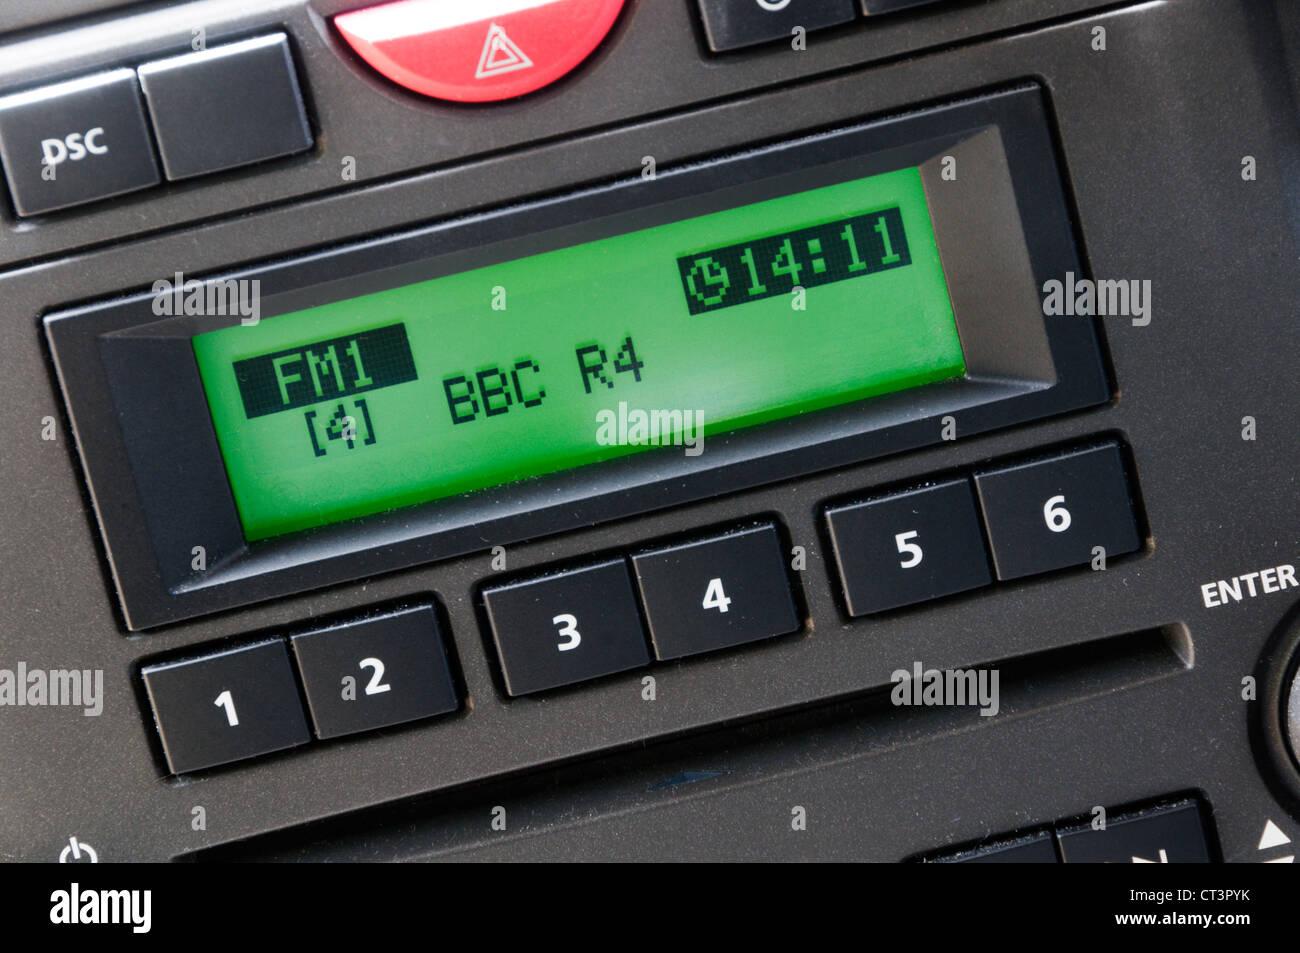 BBC Radio 4 display on analogue car radio. - Stock Image